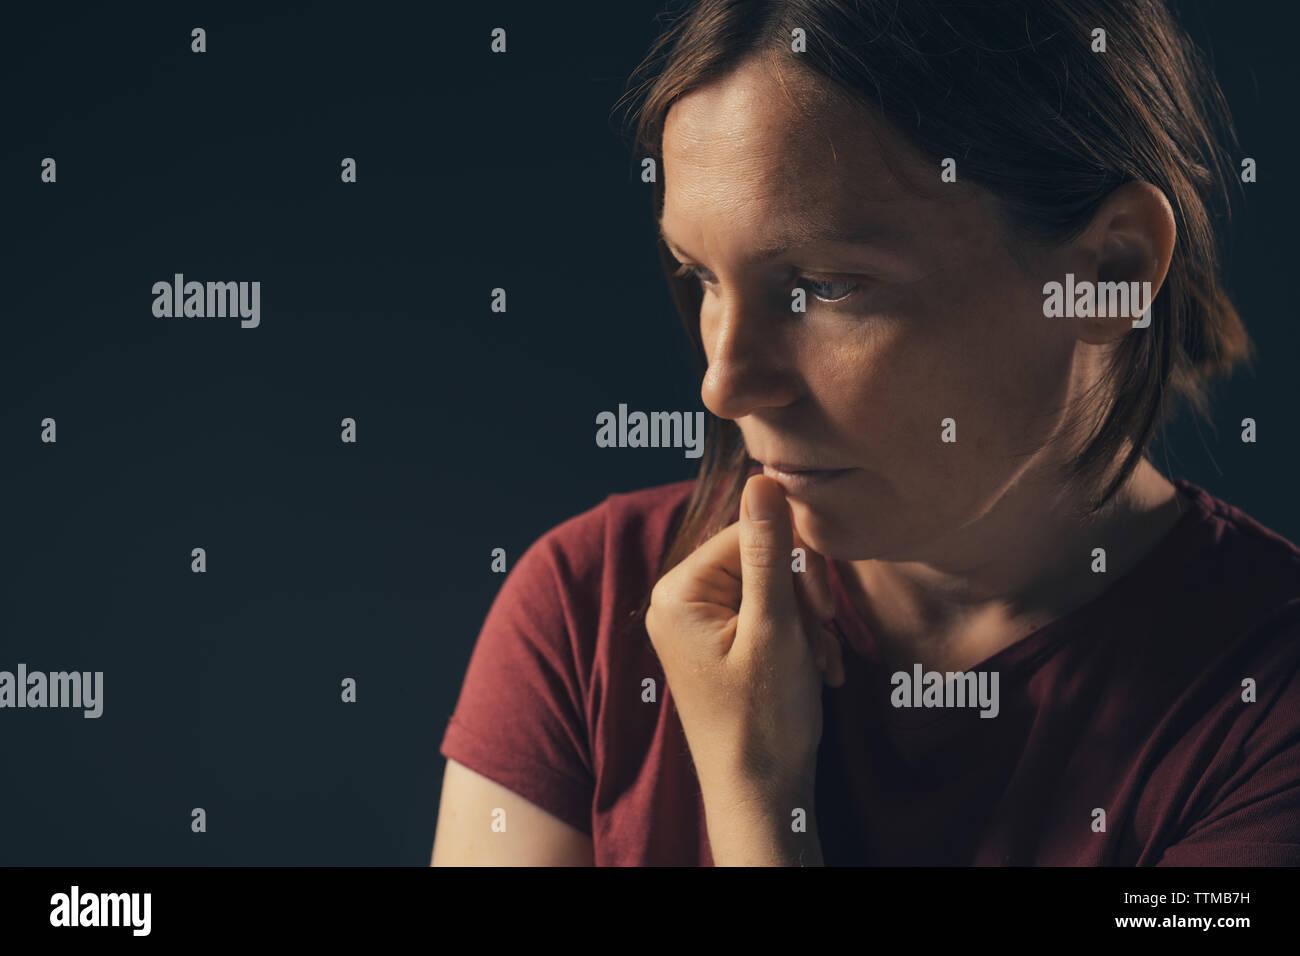 Low key portrait of depressed sad woman - Stock Image